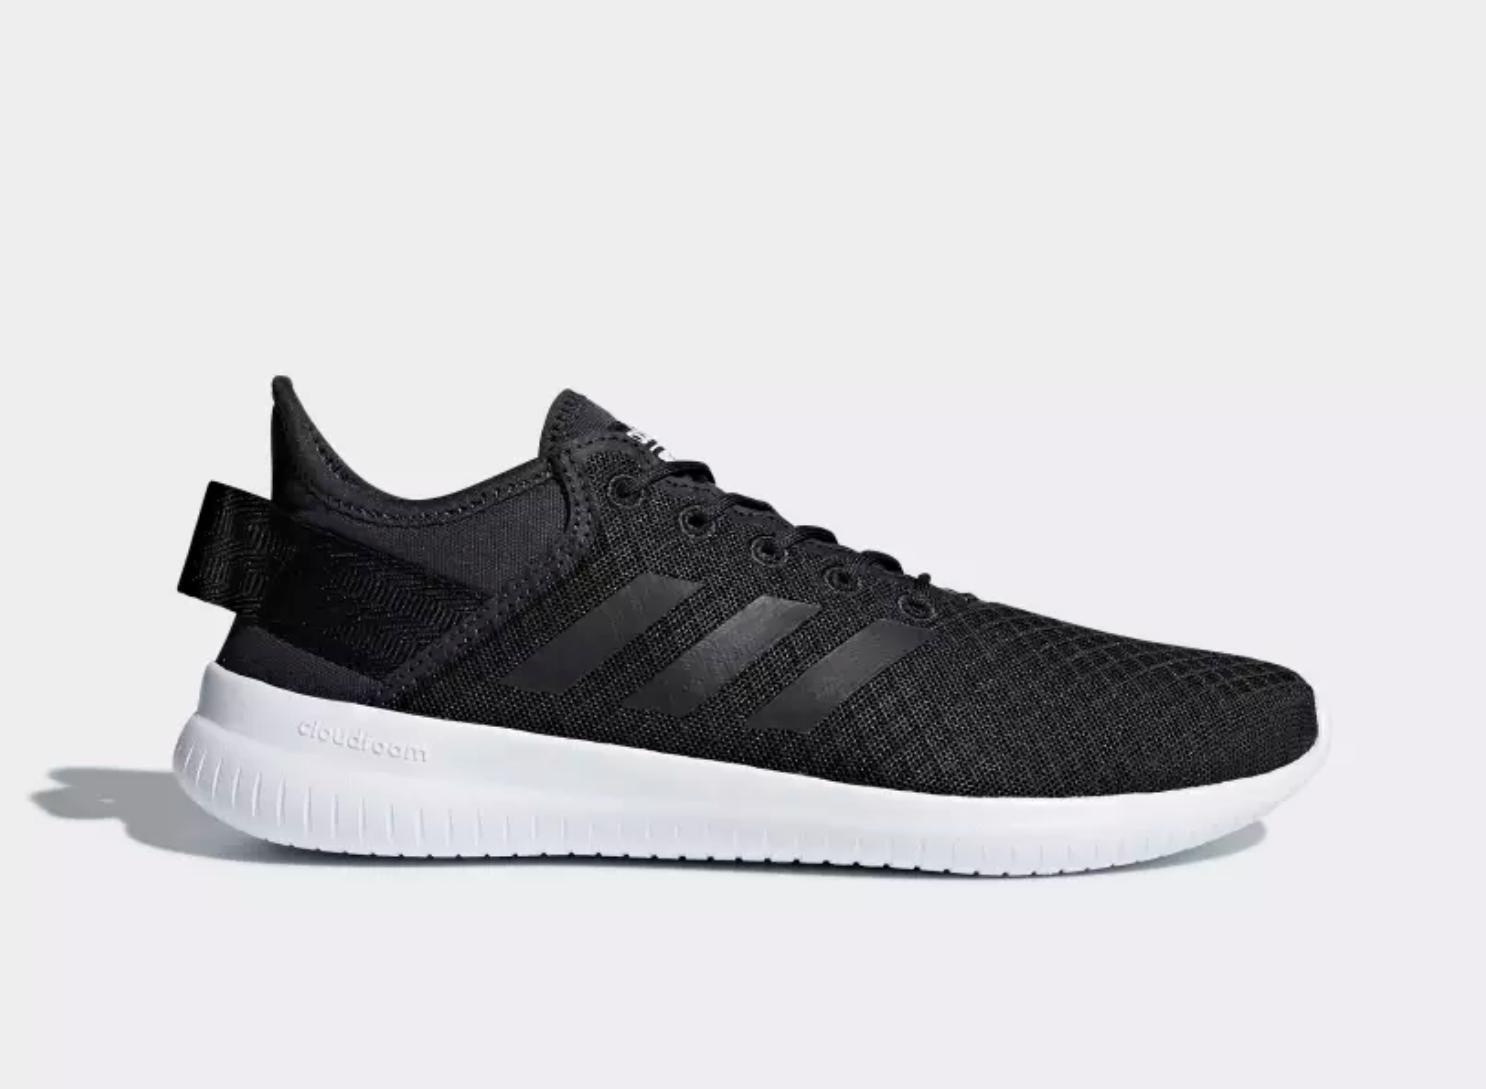 da9449 | Adidas sneakers, Adidas art